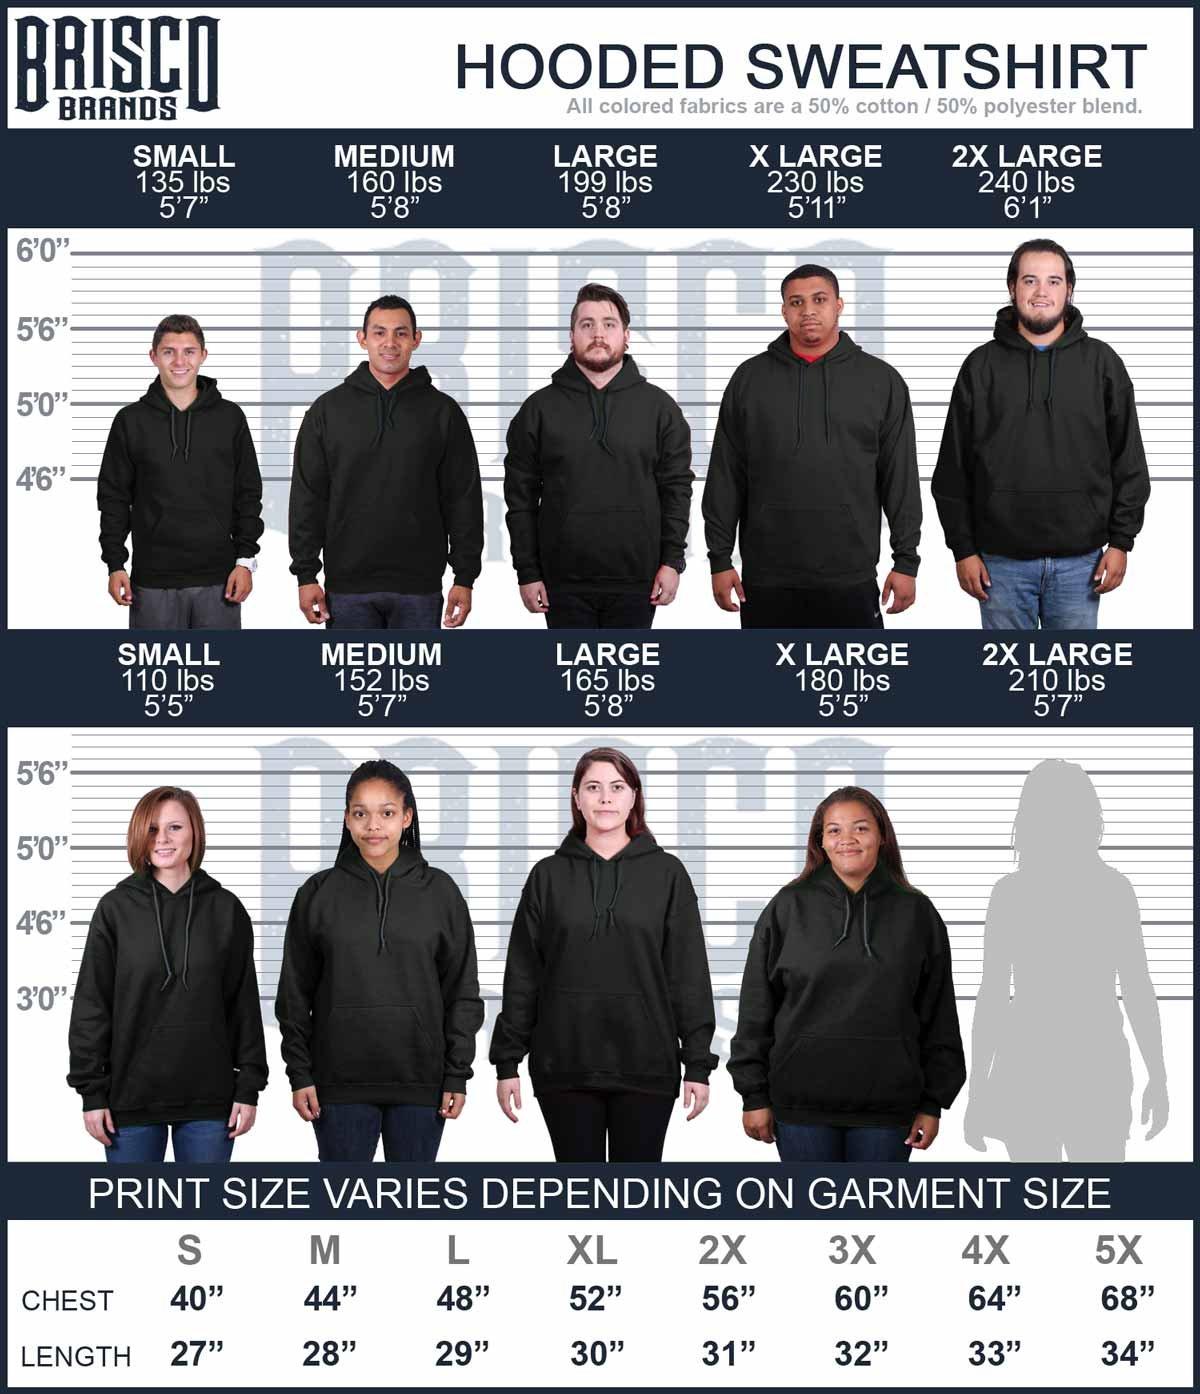 Brisco Brands Portal Rick Sanchez Schwifty Cool Funny Morty GLIP Glop Edgy Hoodie Sweatshirt by Brisco Brands (Image #7)